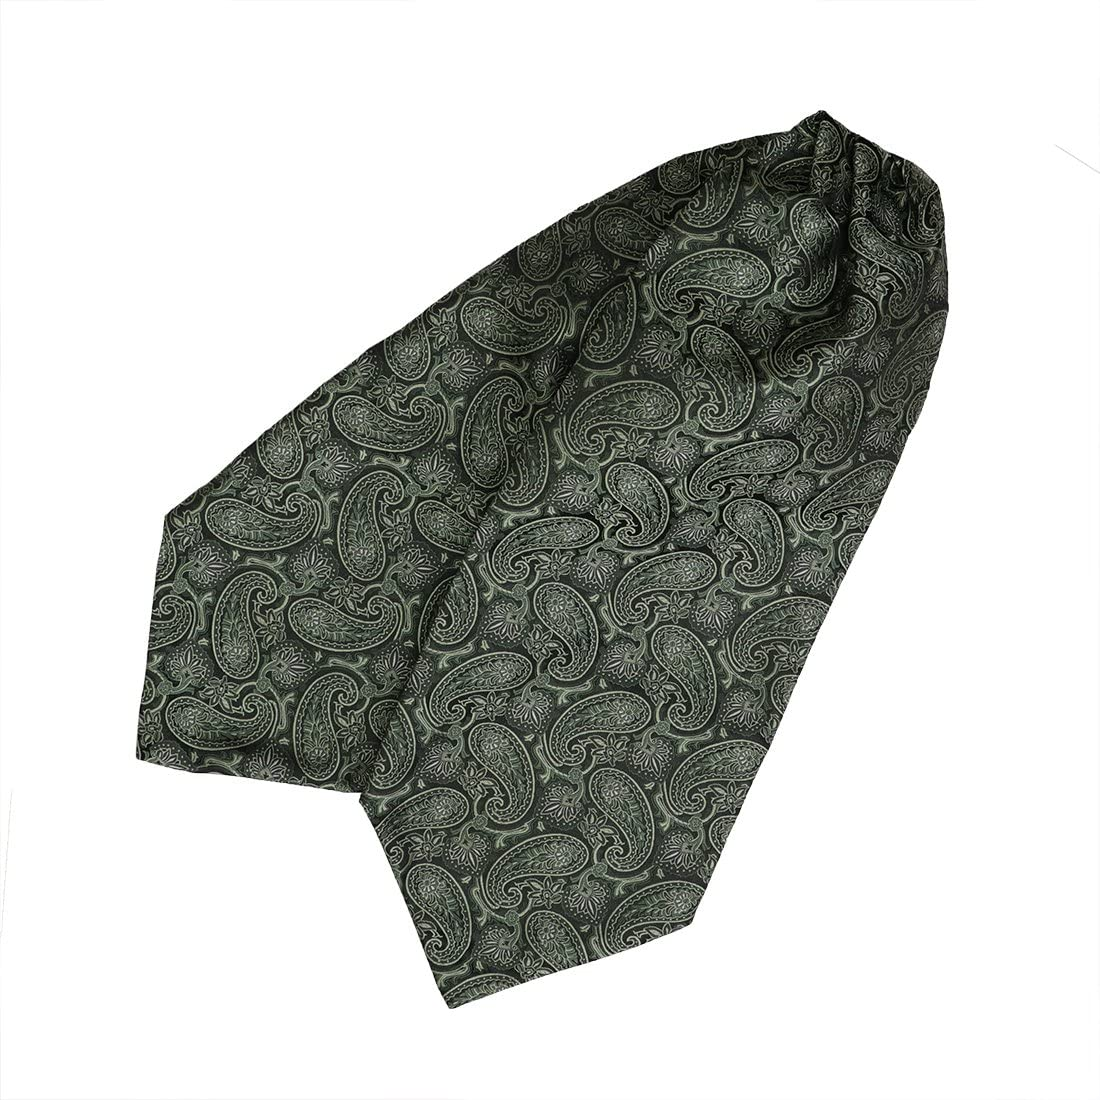 Epoint Men's Fashion Classic Paisley Cravat Silk Ascot Tie Hanky Set, With Box Set